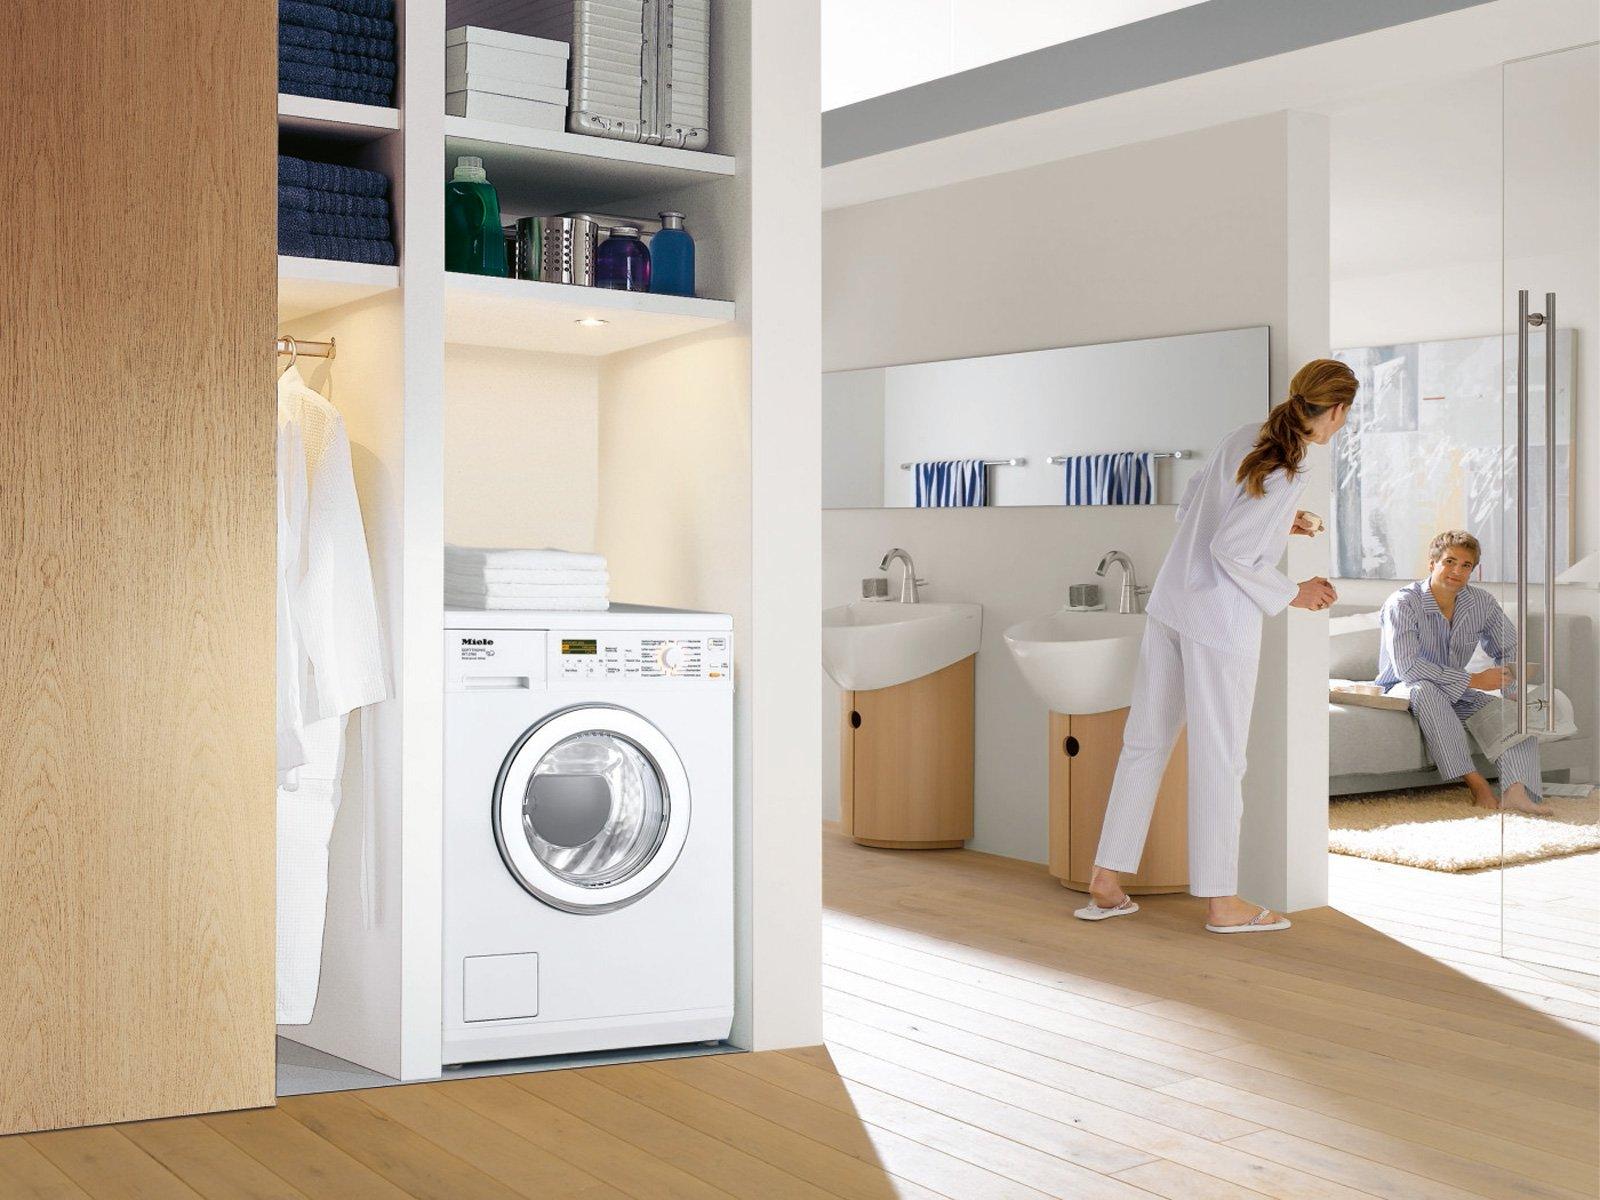 5miele wt 2796 wpm lavasciuga cose di casa. Black Bedroom Furniture Sets. Home Design Ideas